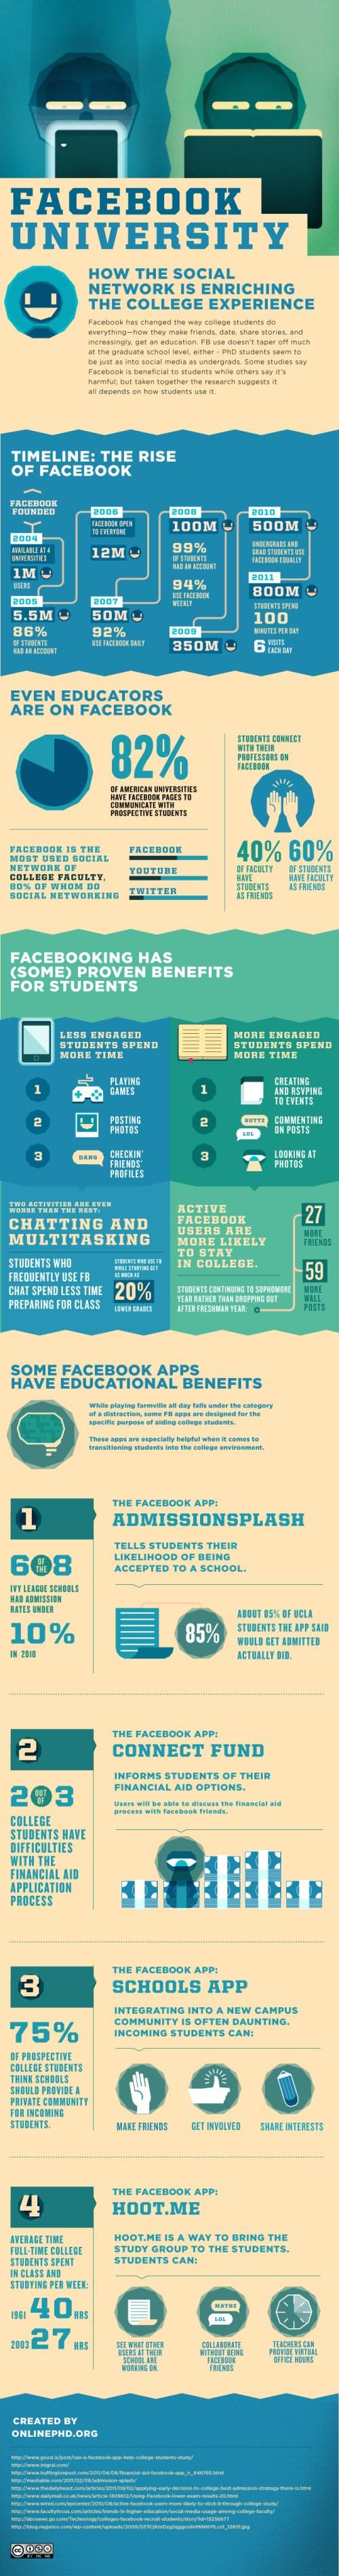 Facebook University